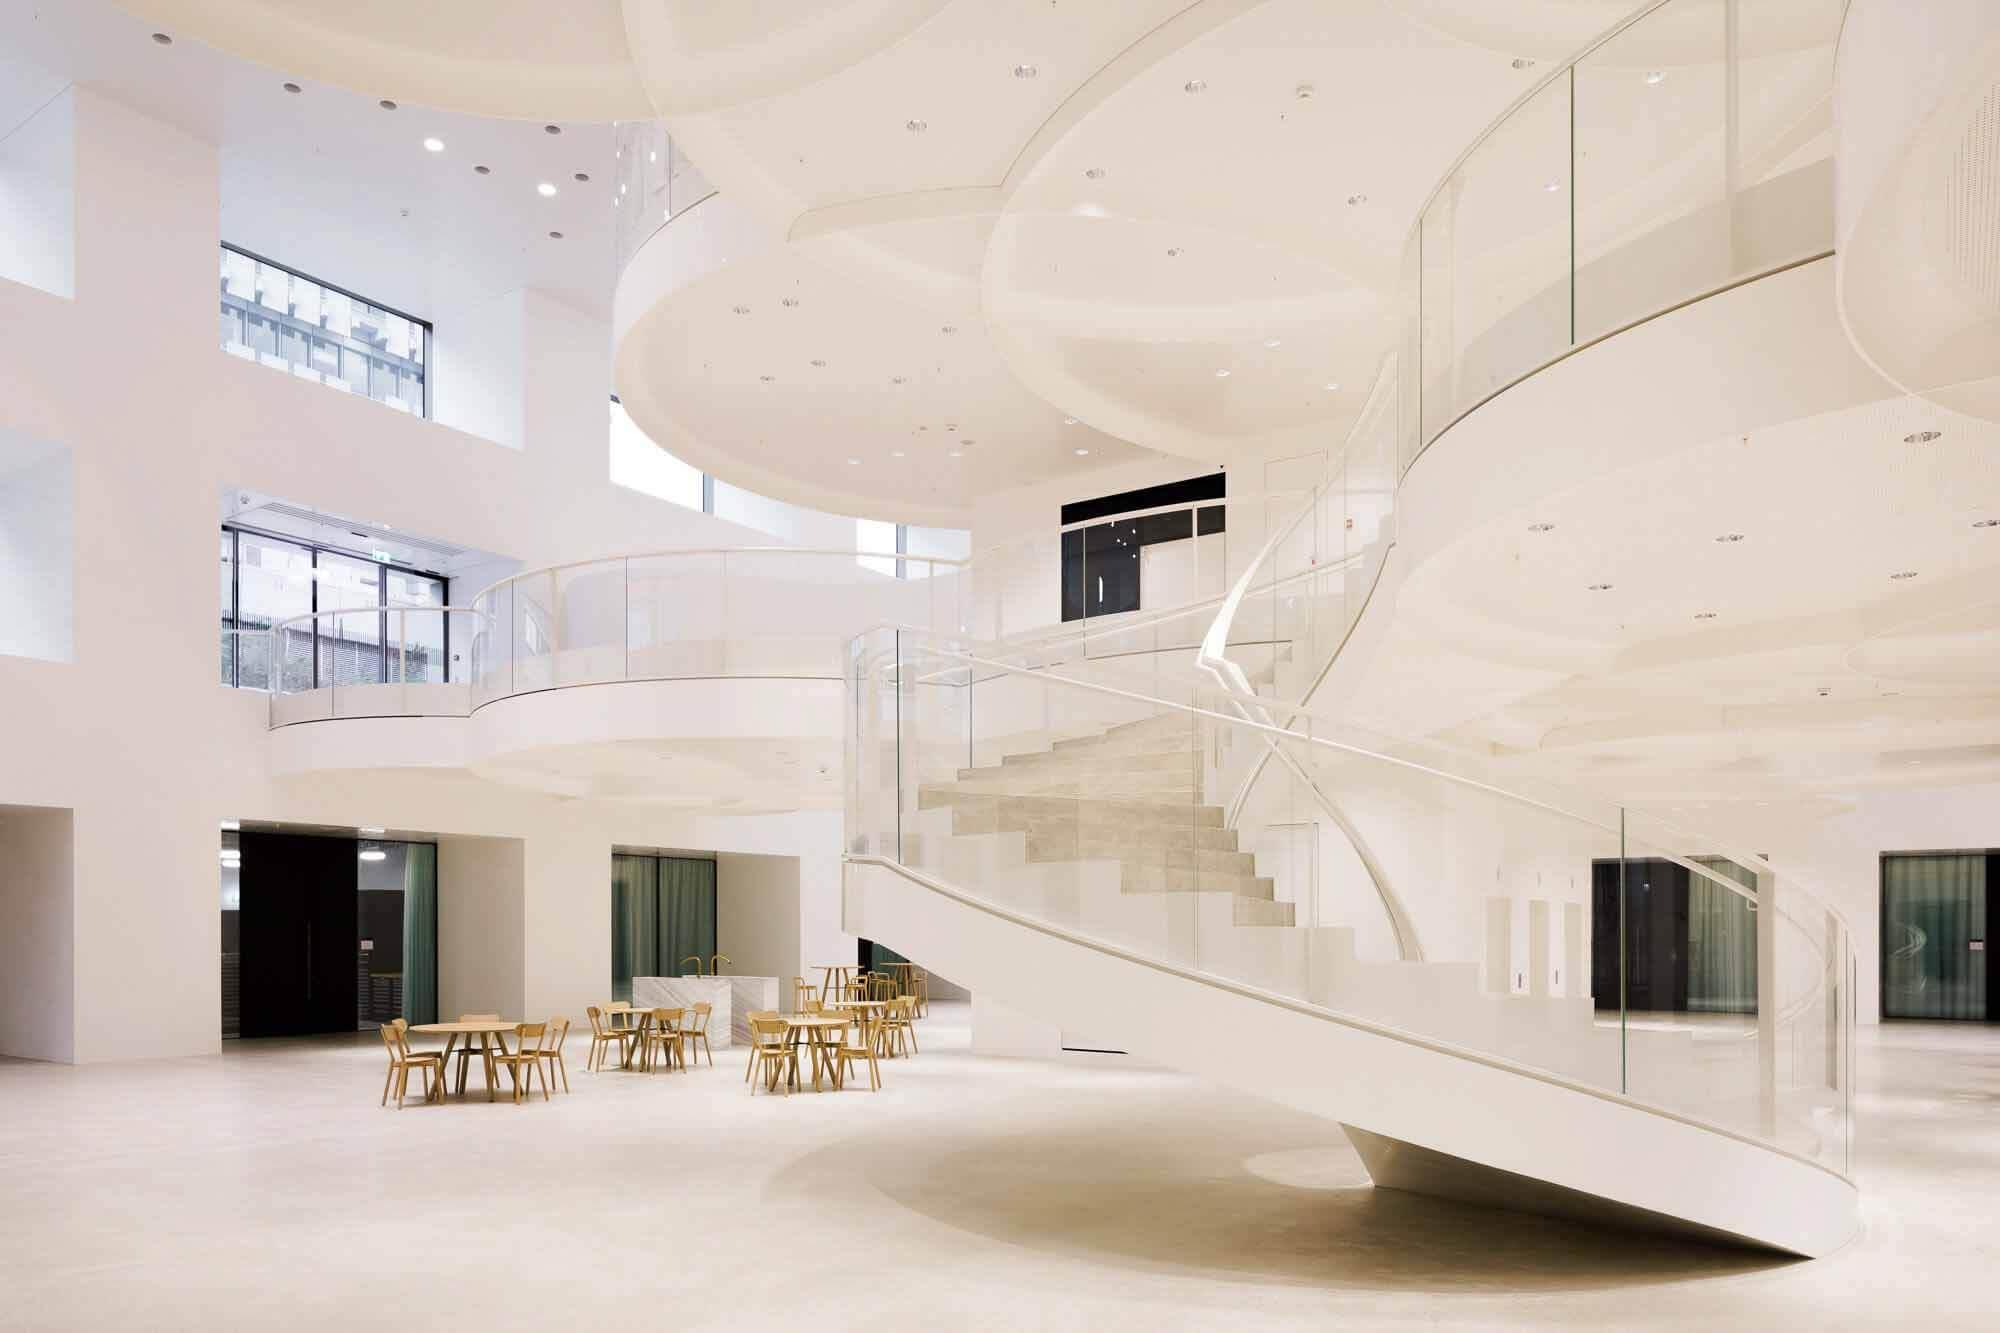 Biozentrum Research Building Базельского университета / Ilg Santer Architekten